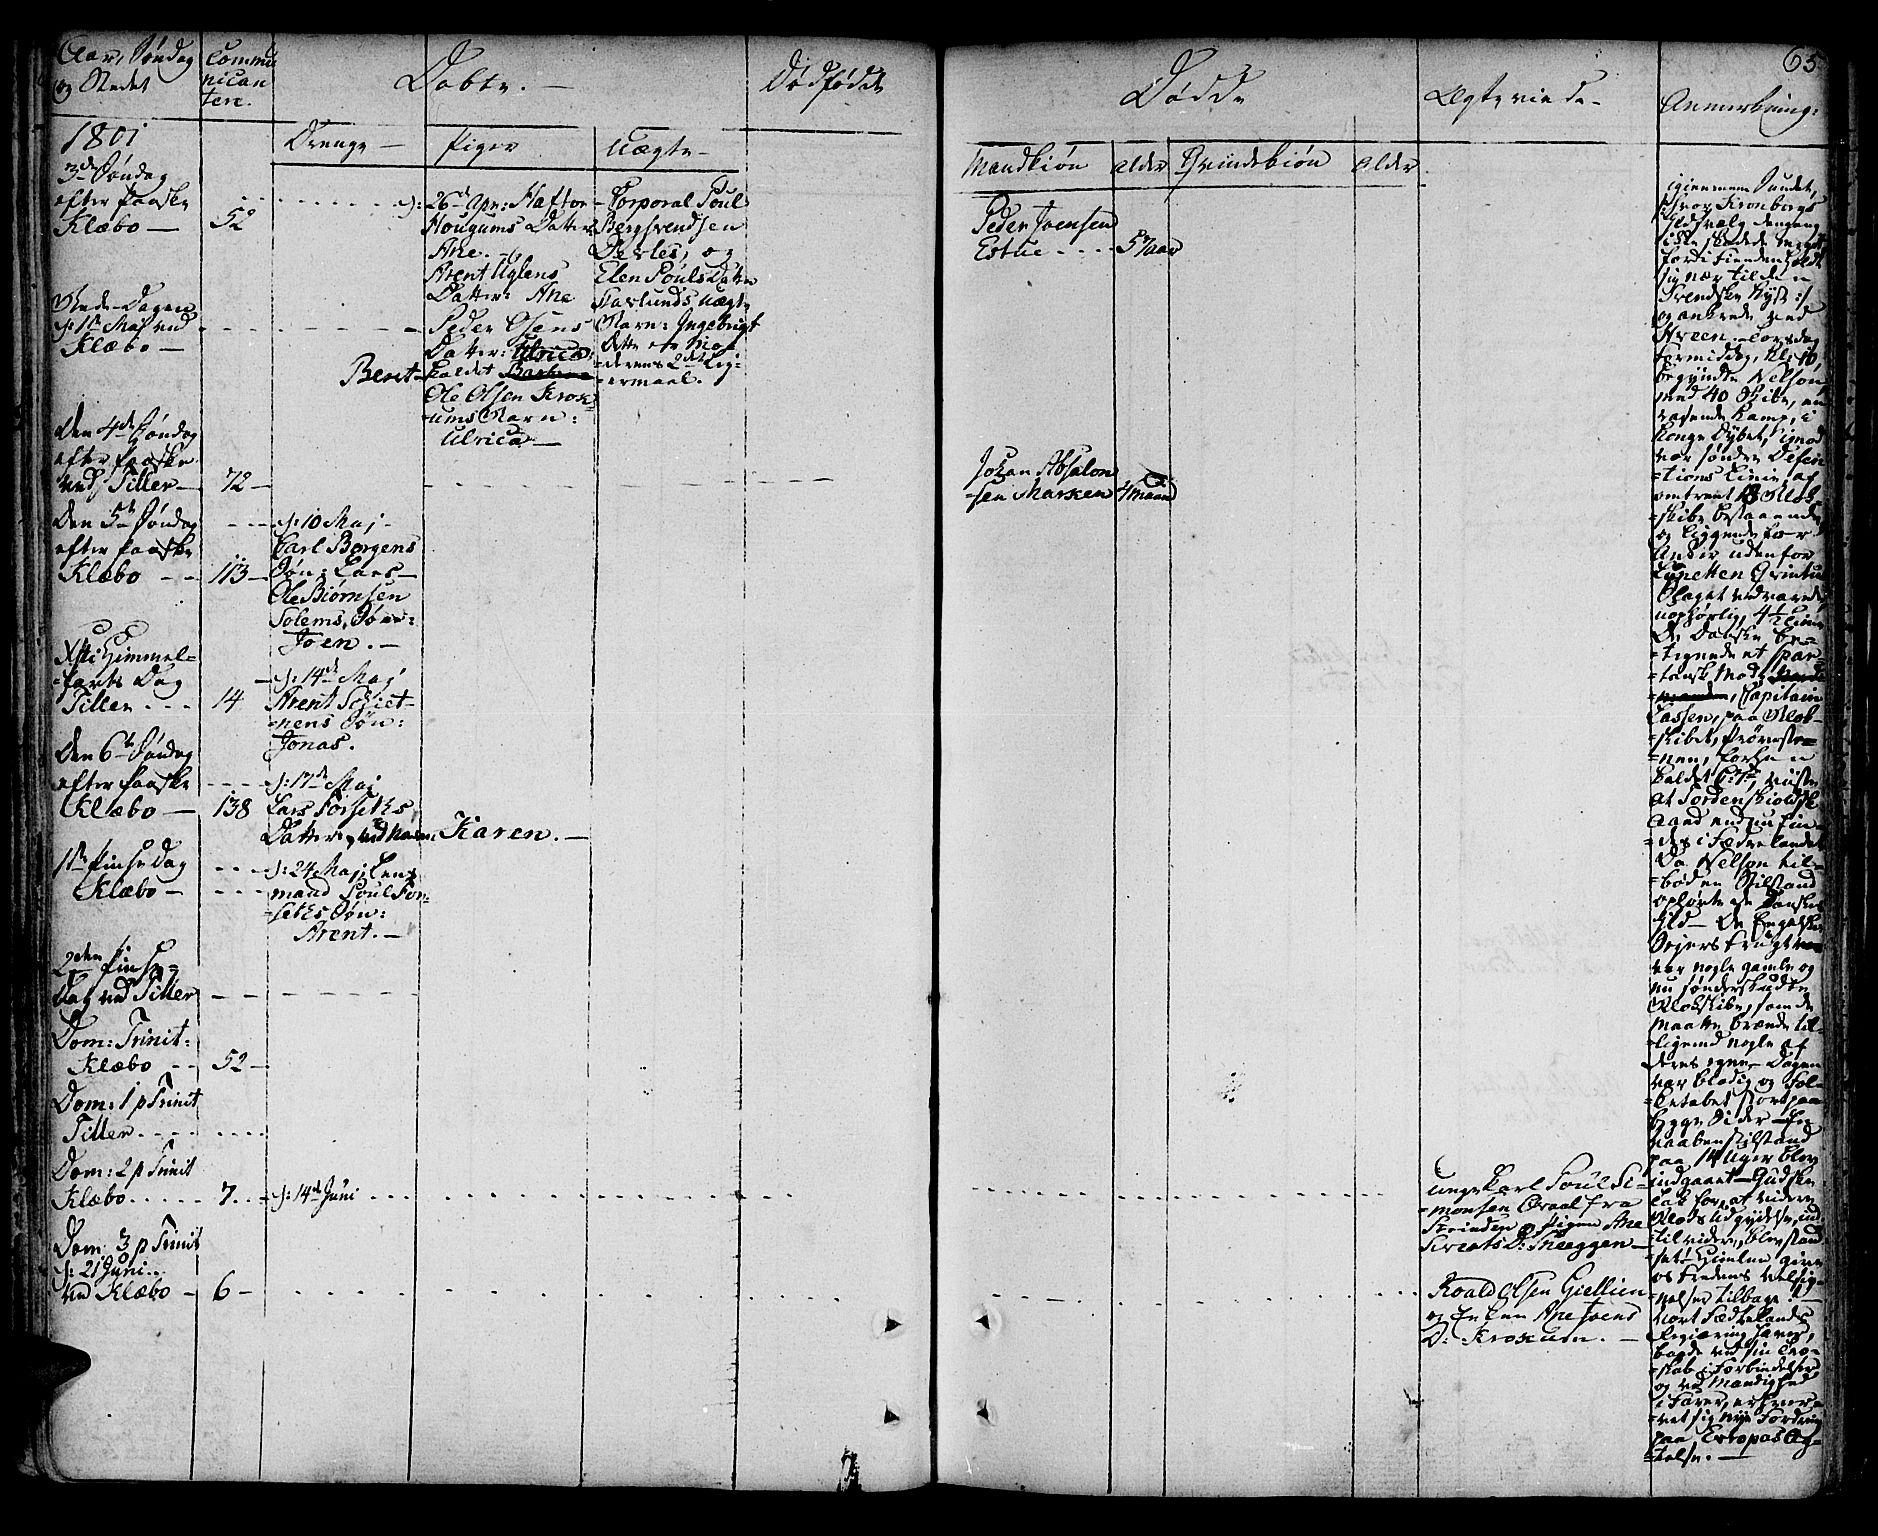 SAT, Ministerialprotokoller, klokkerbøker og fødselsregistre - Sør-Trøndelag, 618/L0438: Parish register (official) no. 618A03, 1783-1815, p. 65